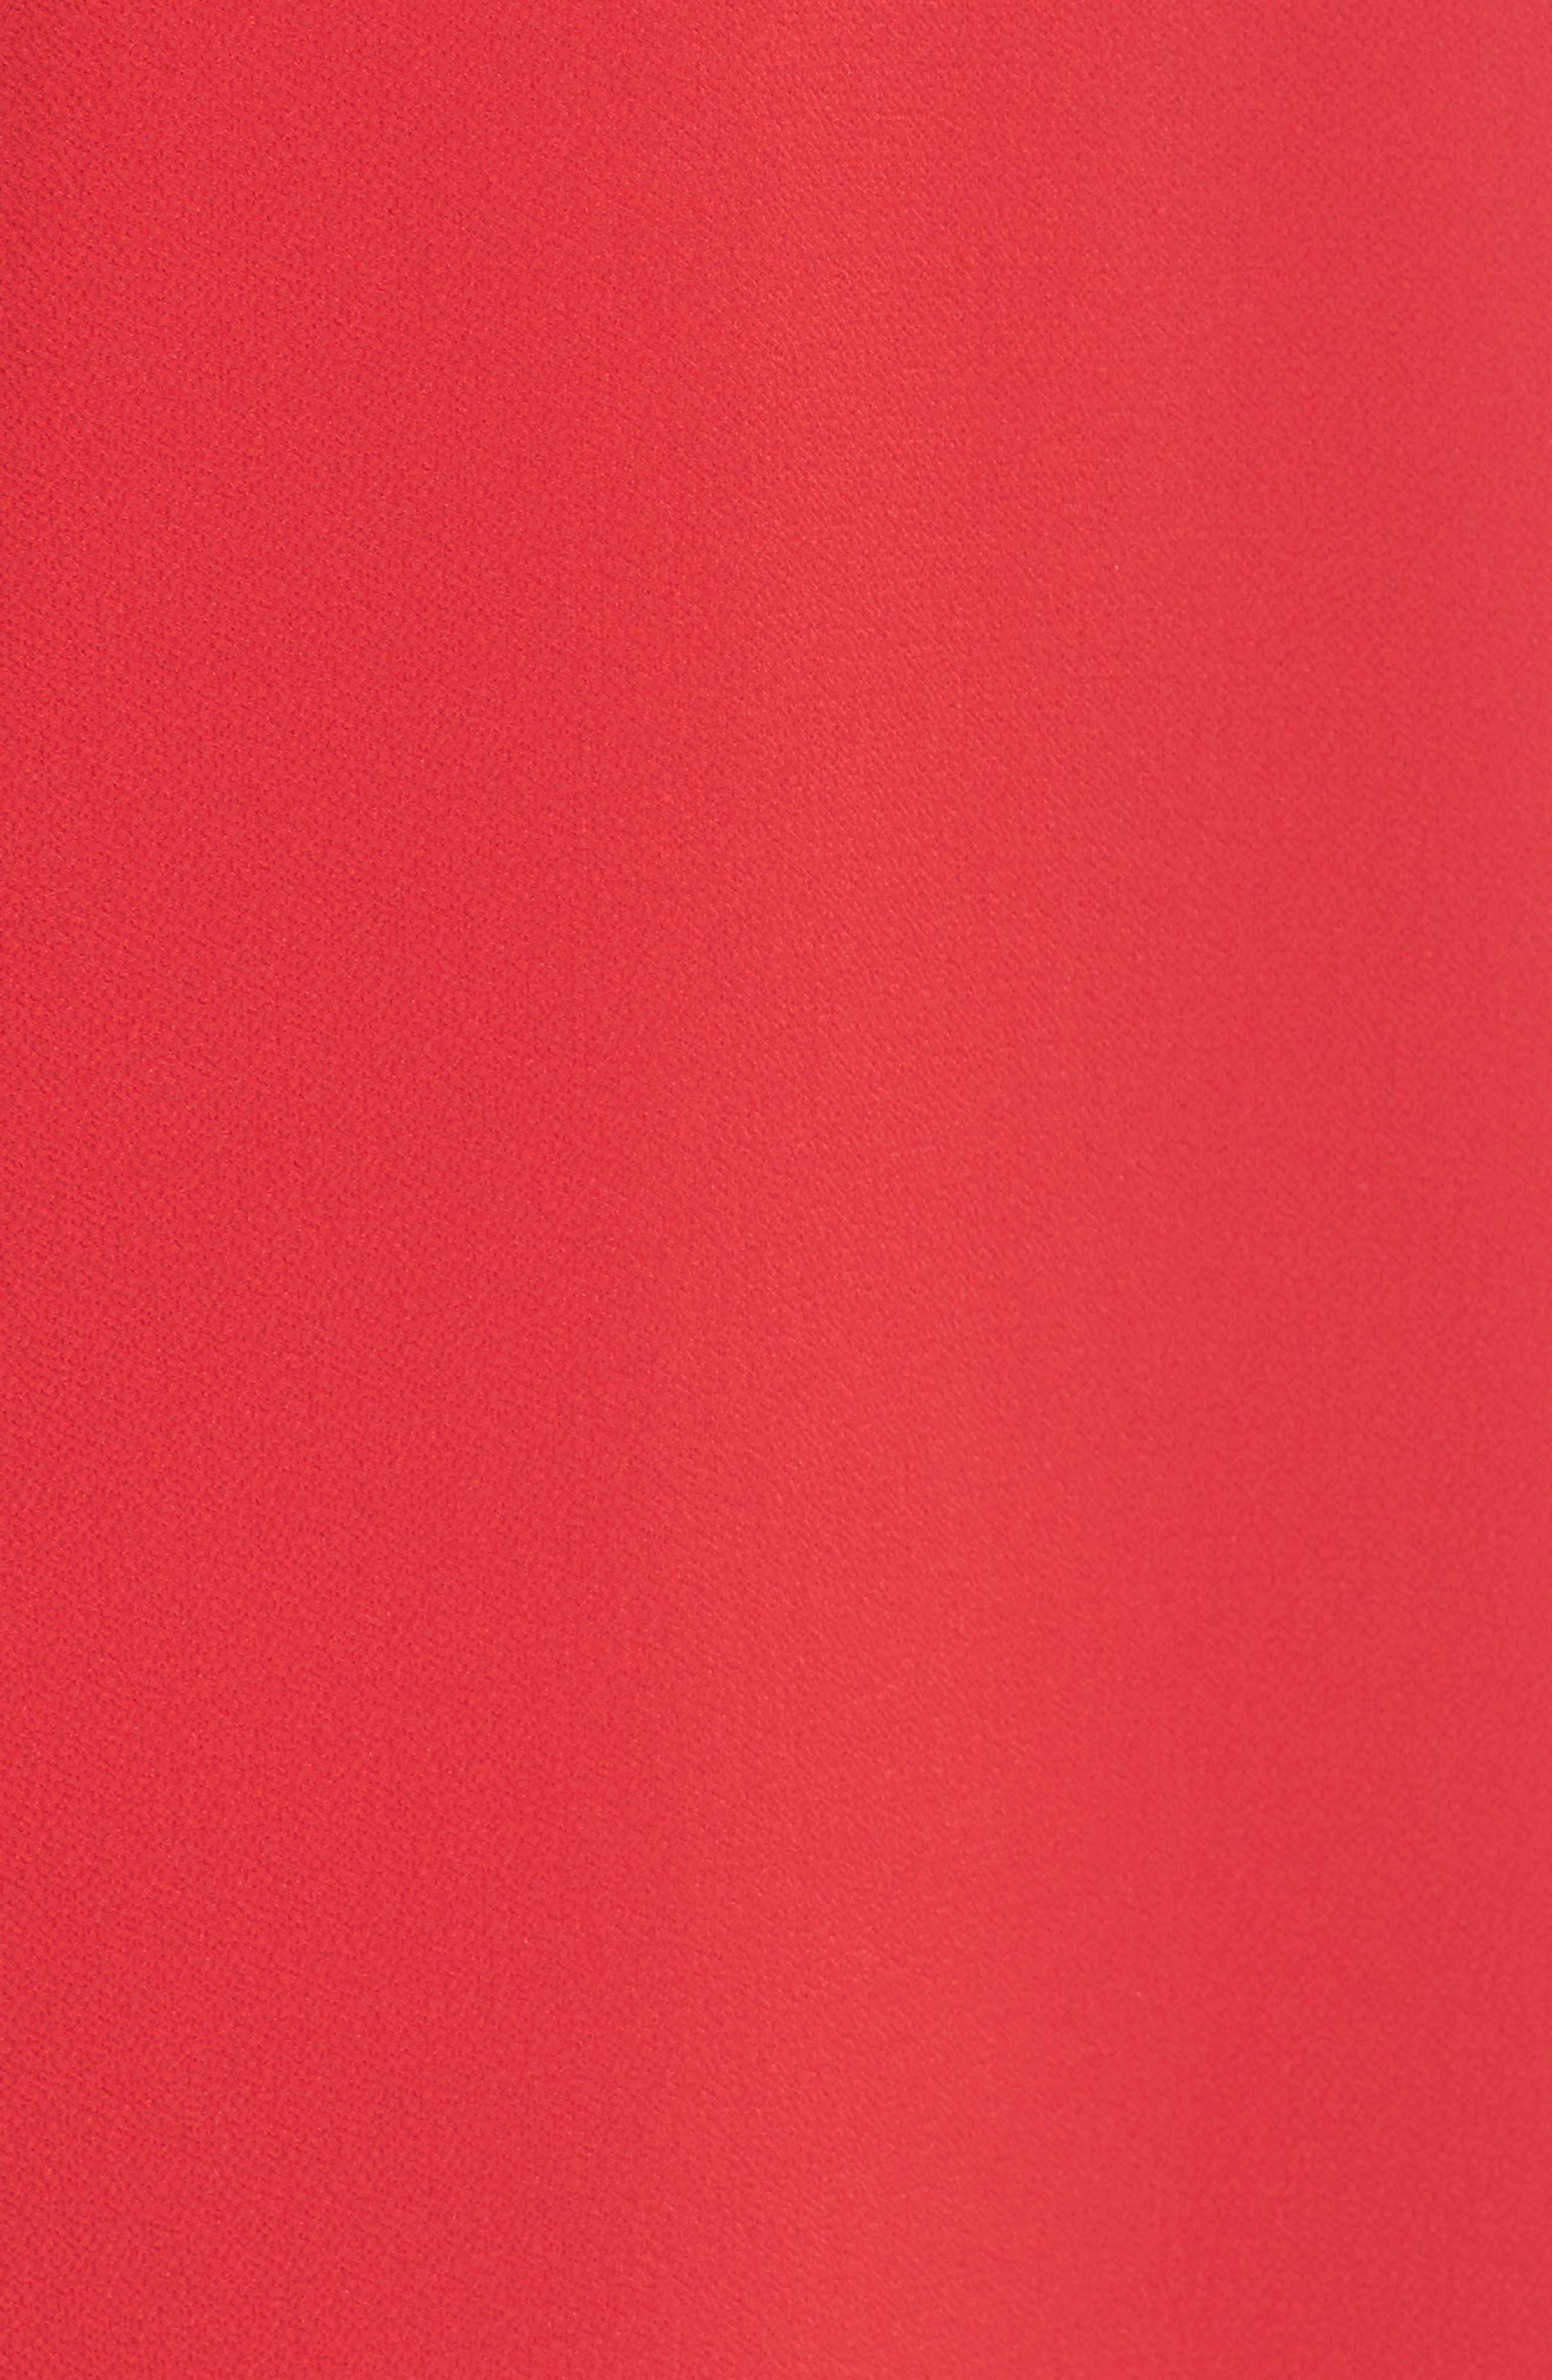 Dolman Sleeve Dress,                             Alternate thumbnail 6, color,                             614